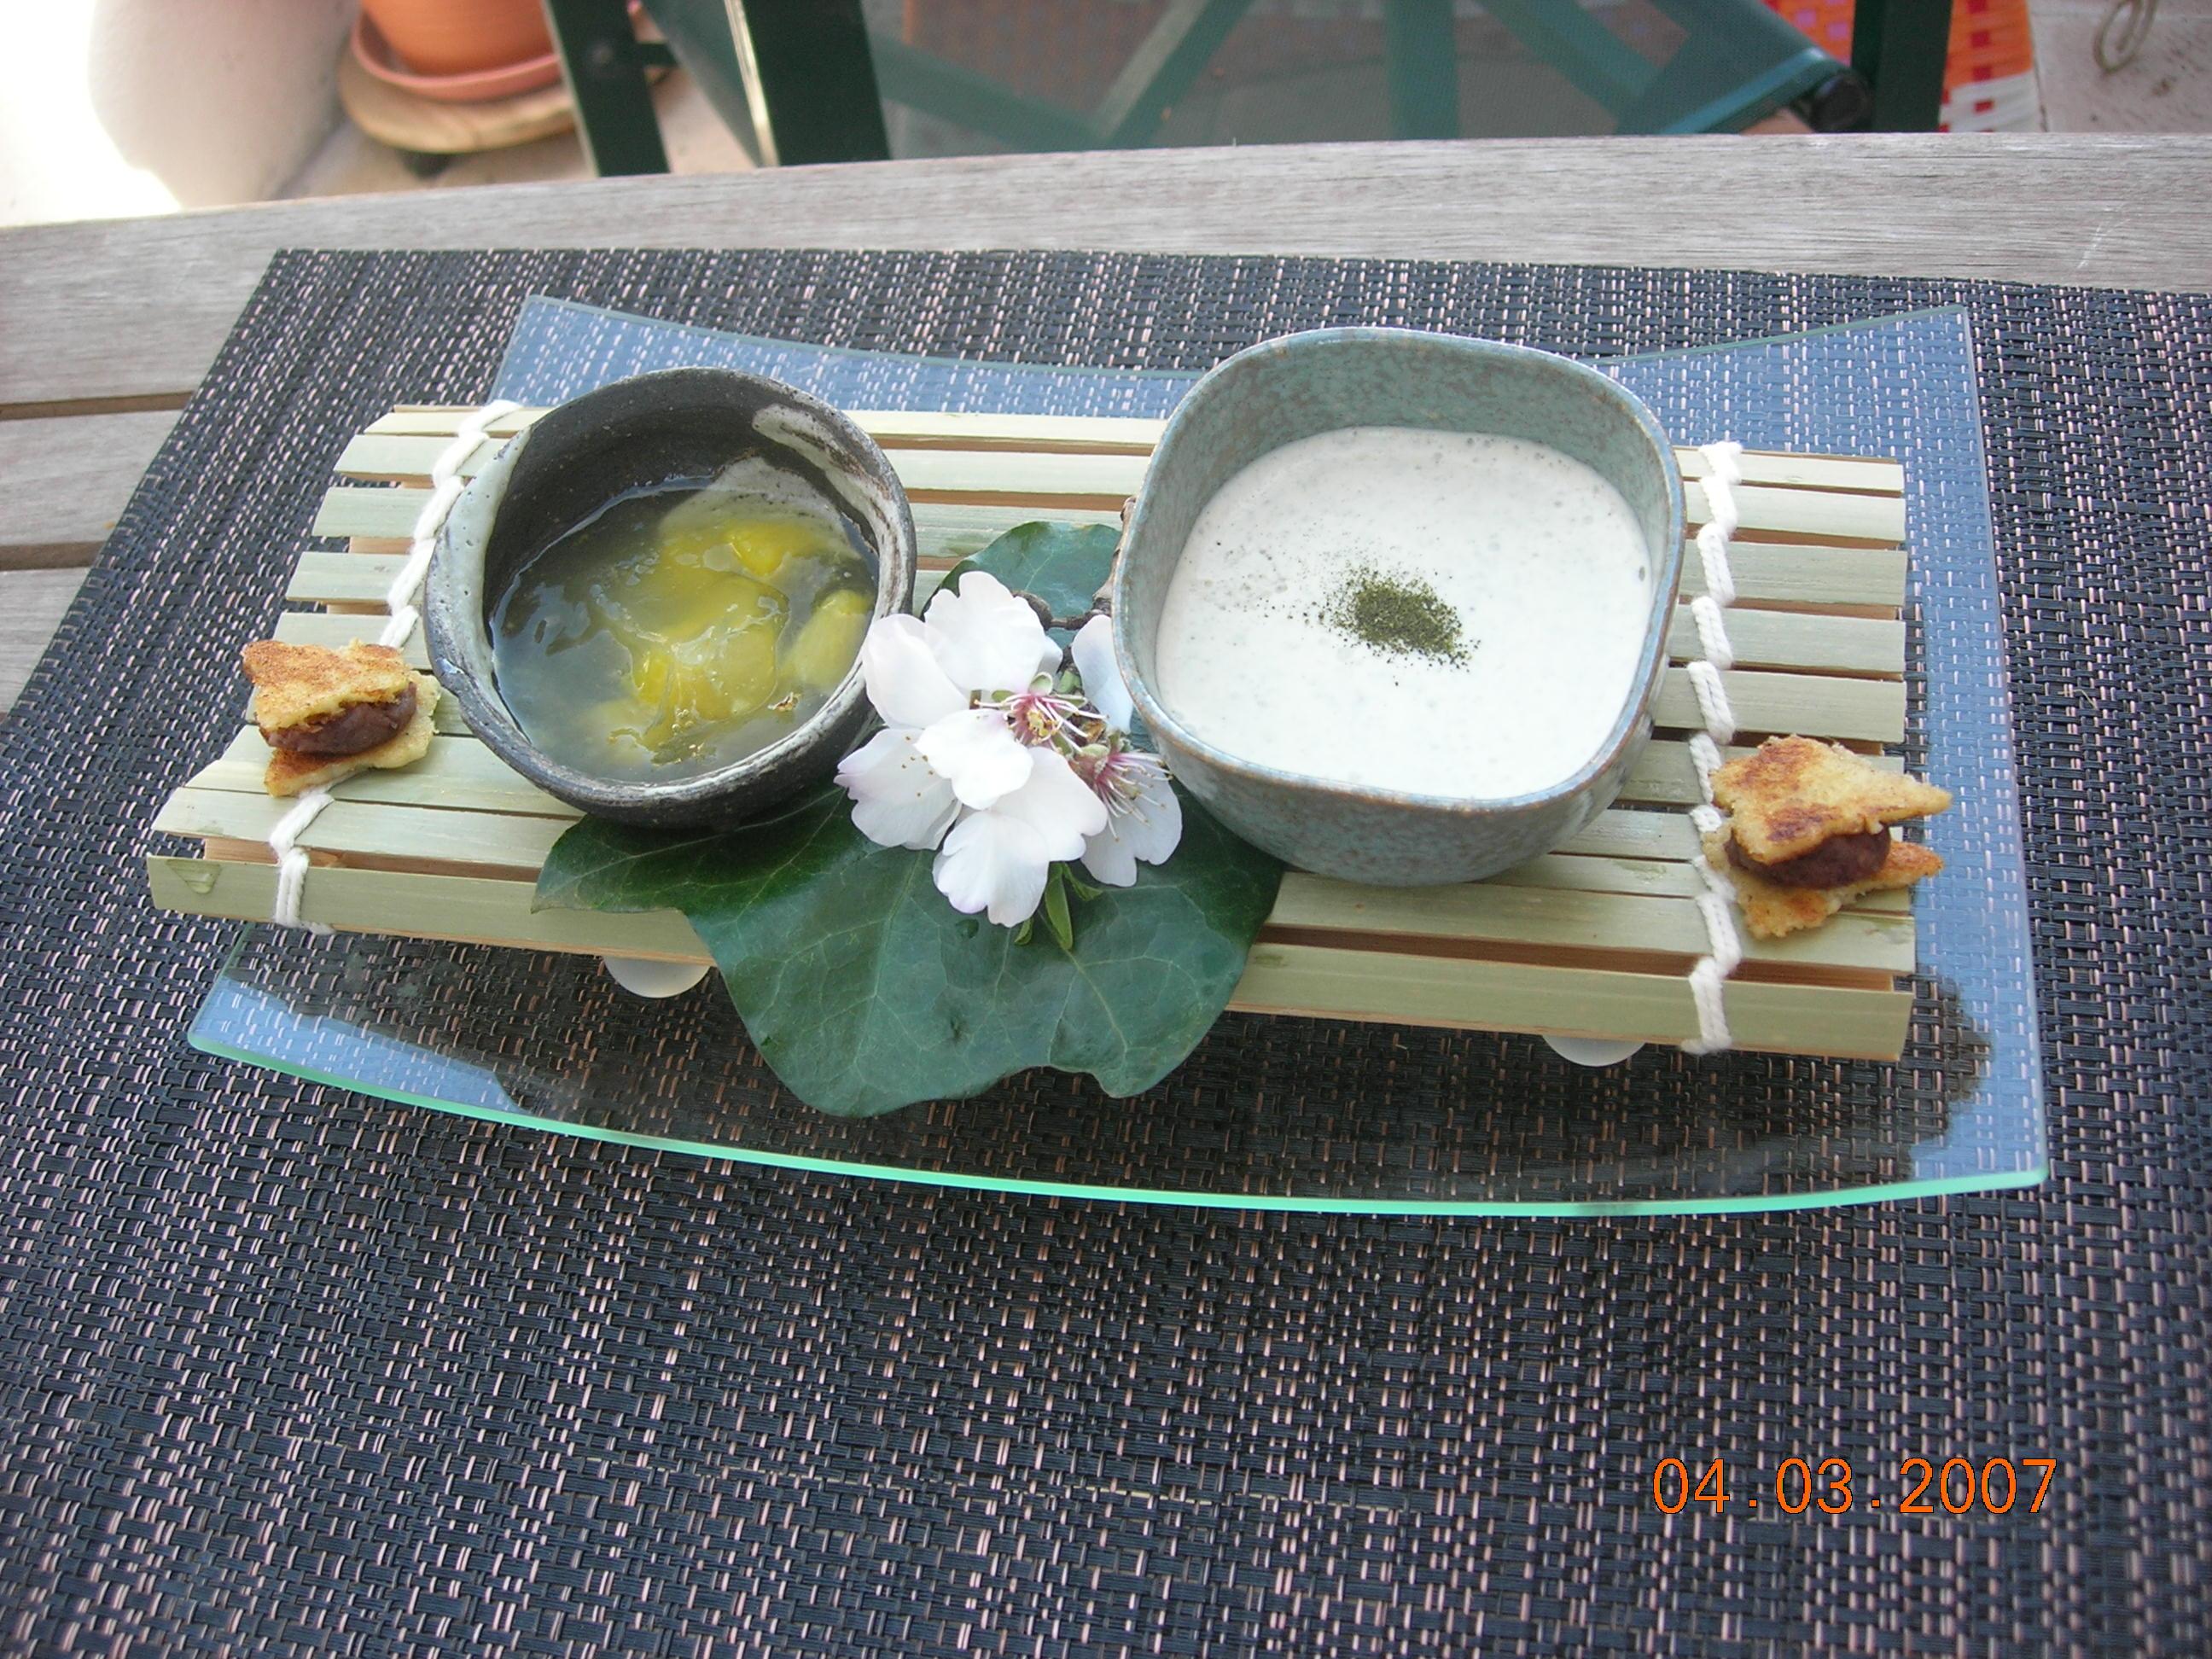 Cuisine gastronomique 15 for Cuisine gastronomique